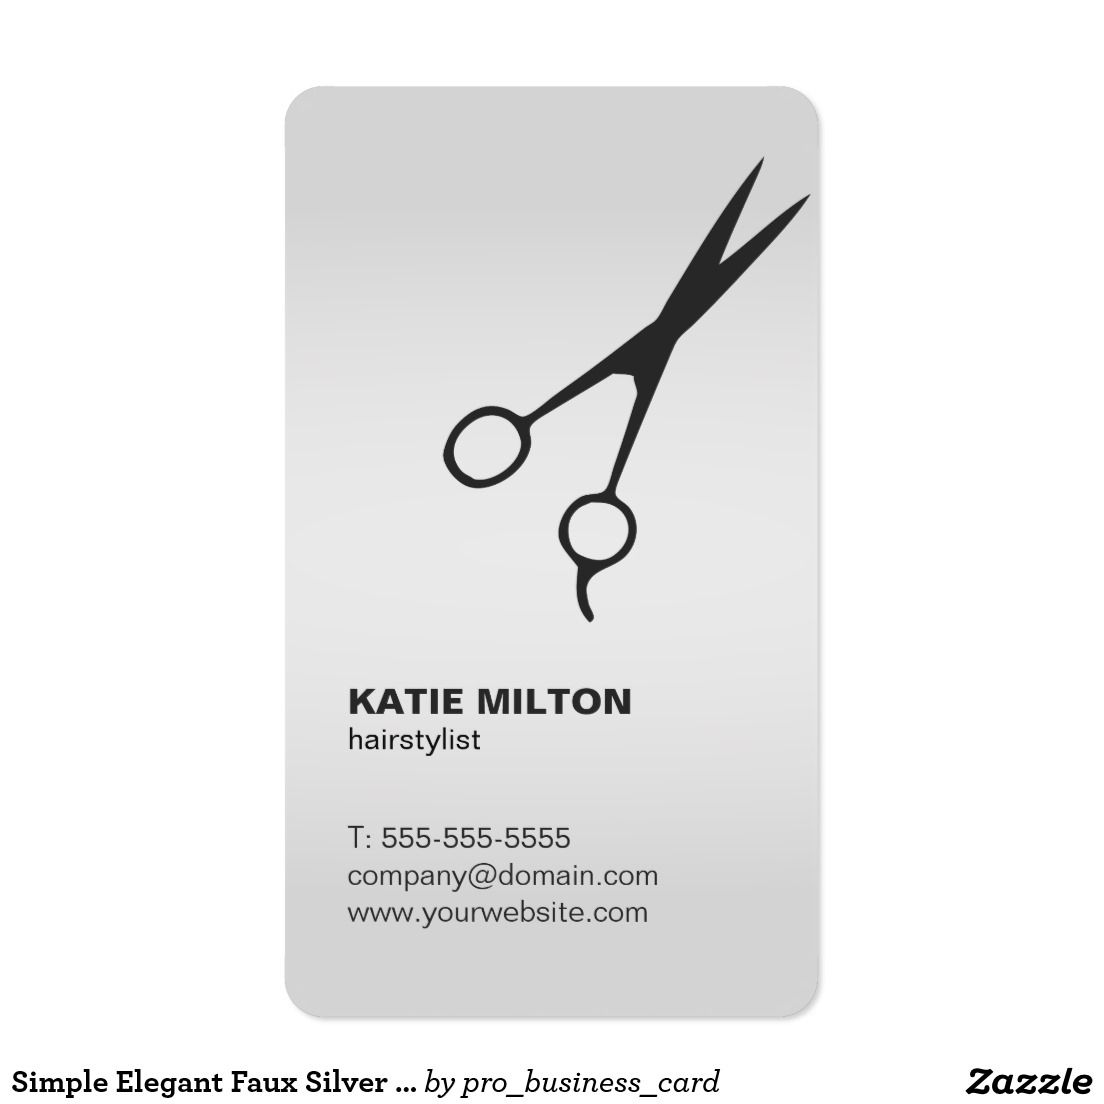 Simple Elegant Faux Silver Black Scissor Hairstyle Business Card ...